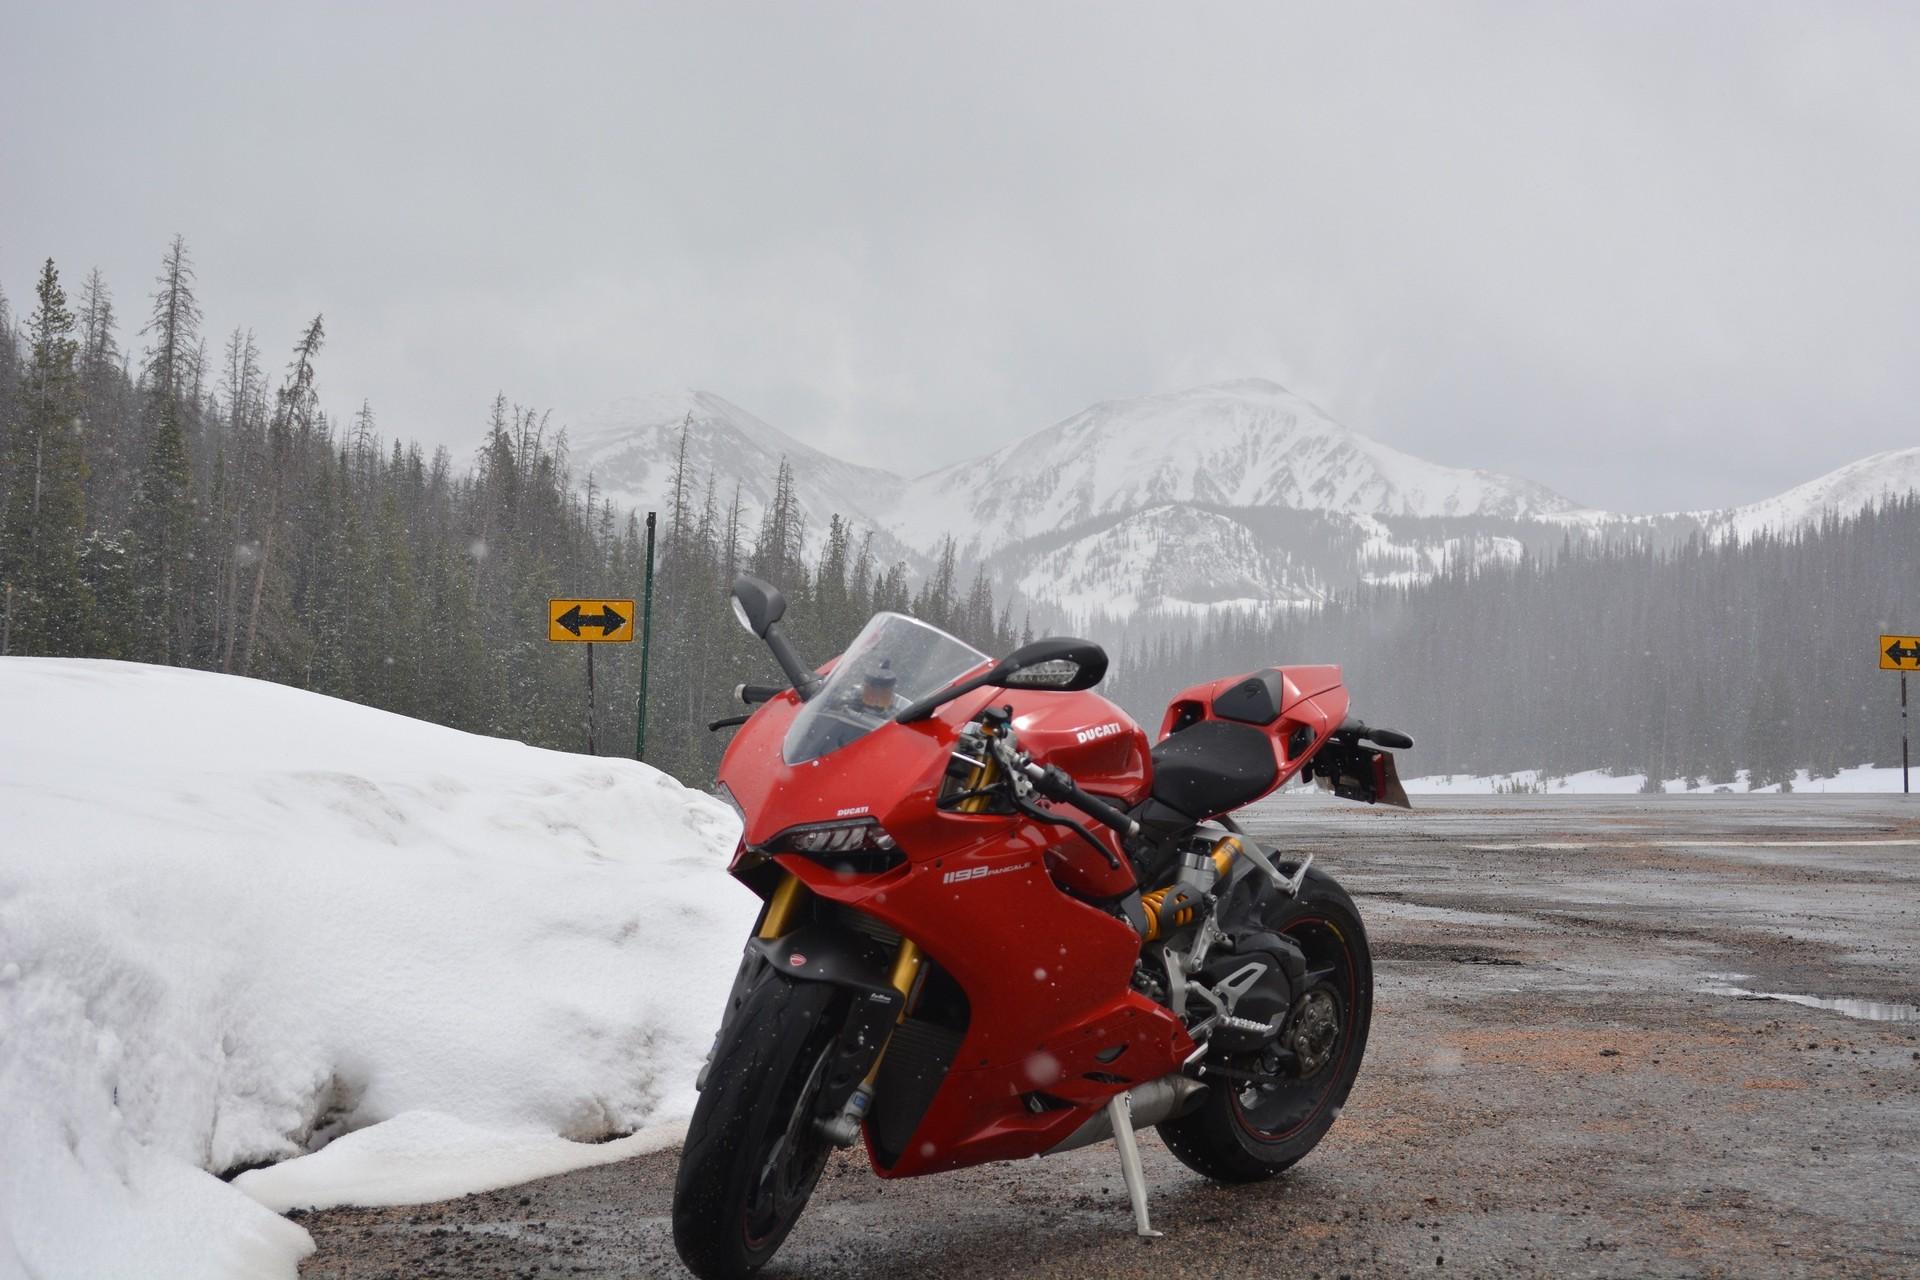 Ducati Superbike 1299 Panigale S 2015 HD wallpaper 1920x1280